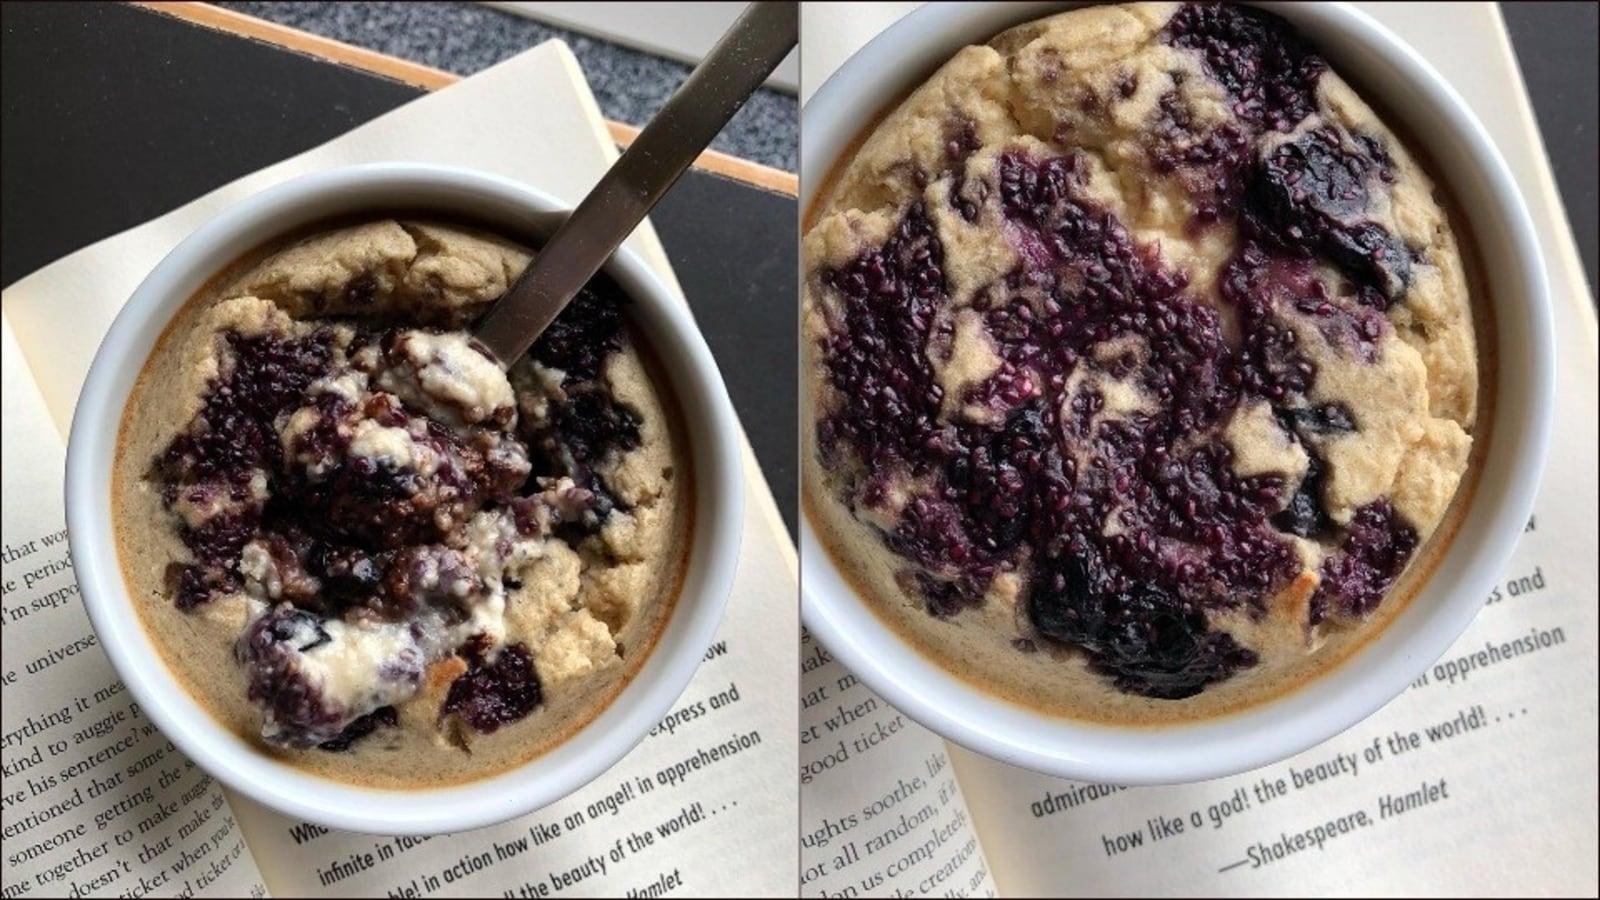 Recipe: Got an overripe banana? Use it to make blueberry chia jam baked oats